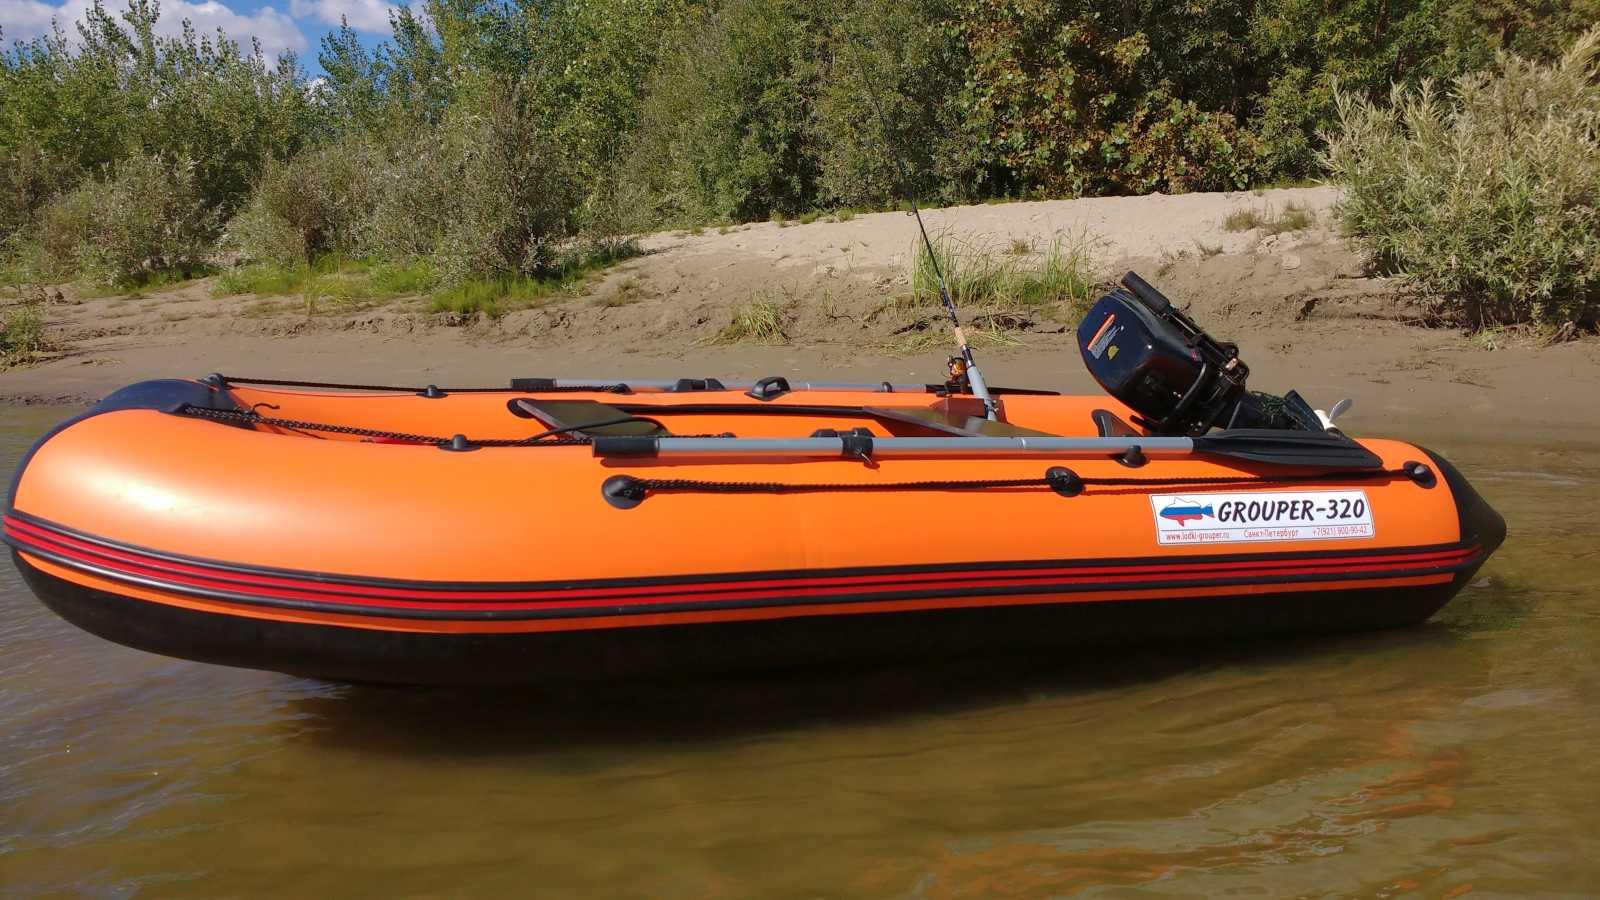 Групер лодки все фото